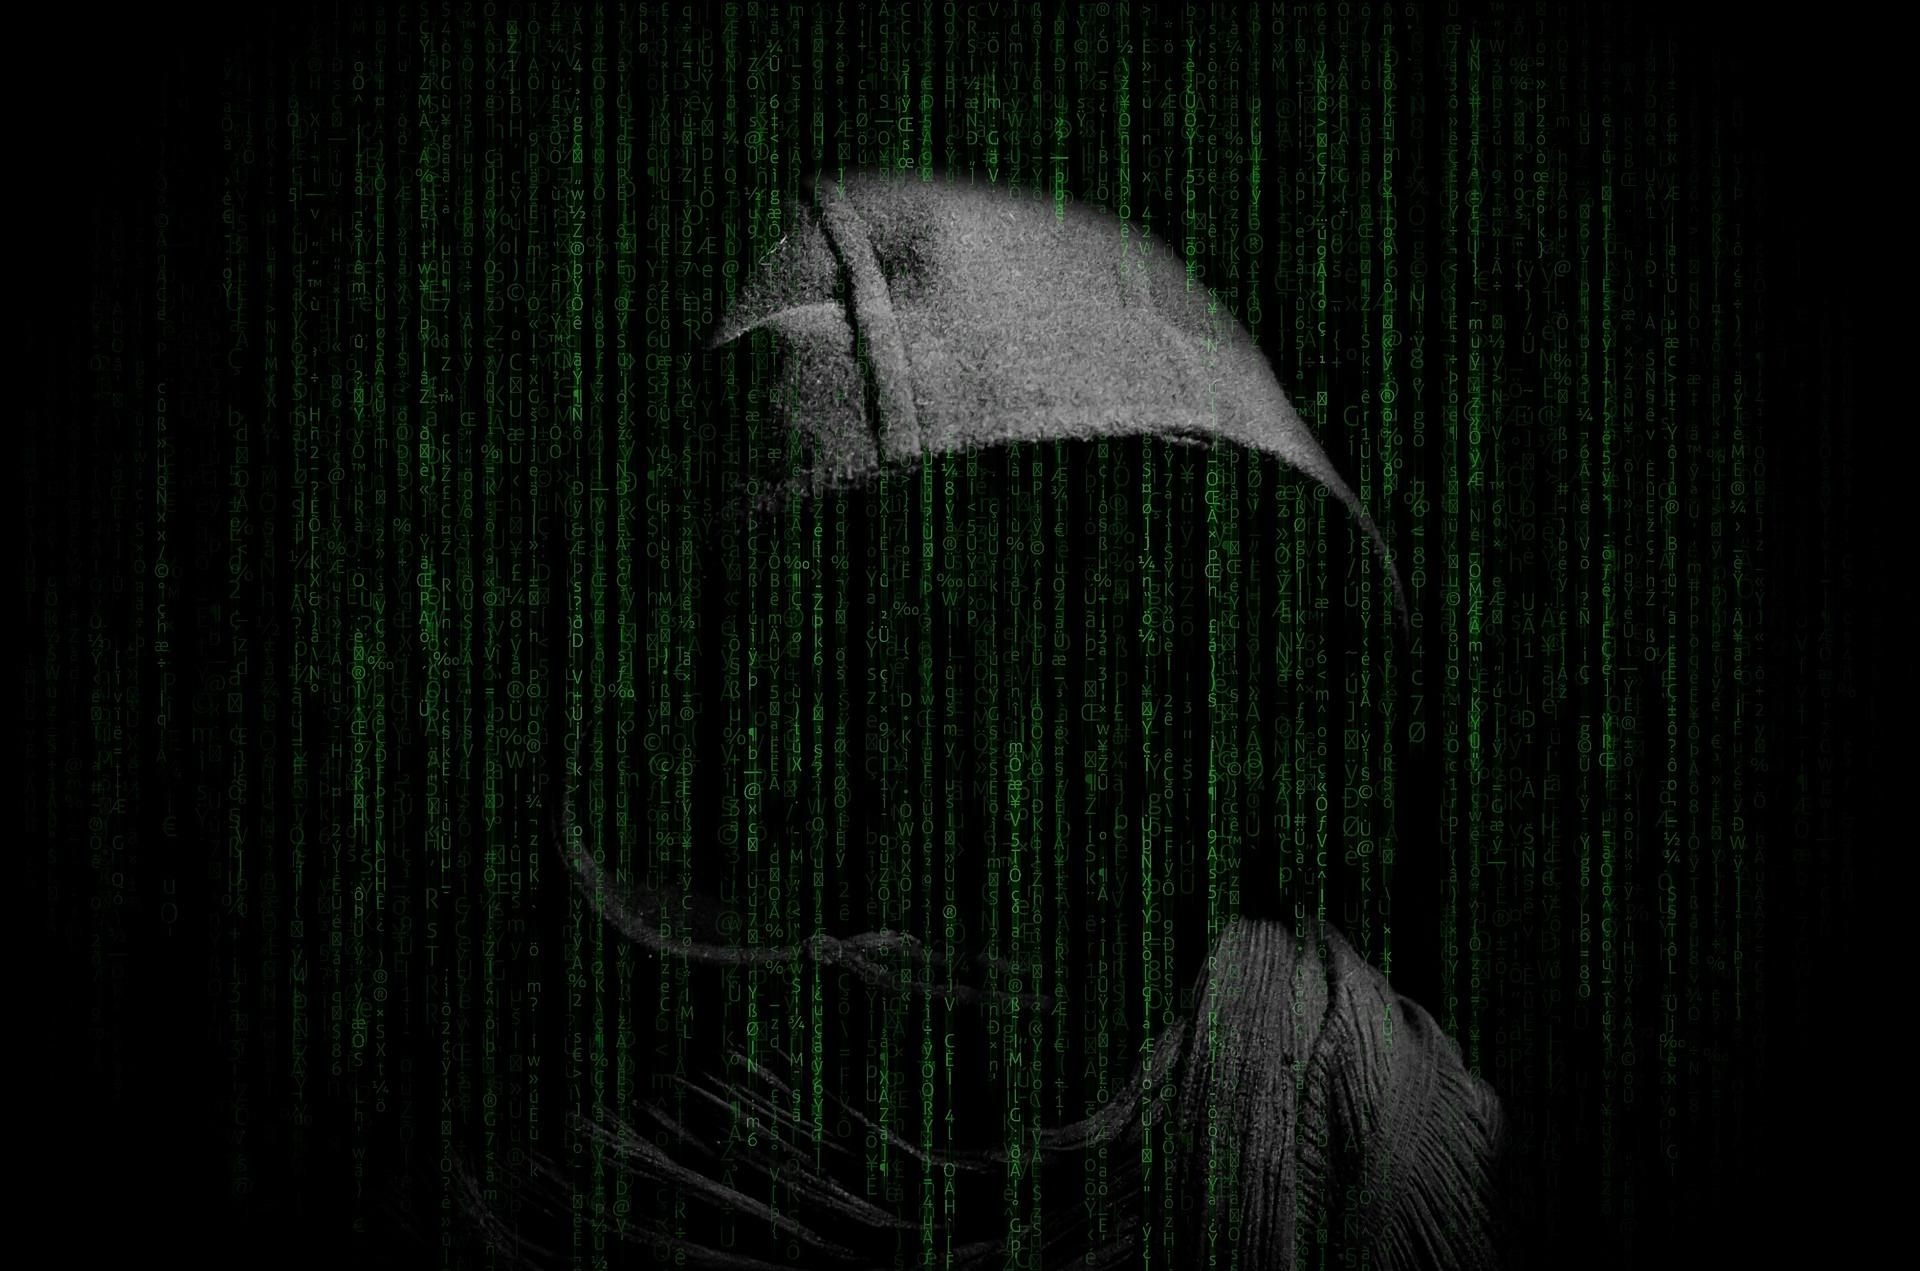 Man in dark hood with digital background